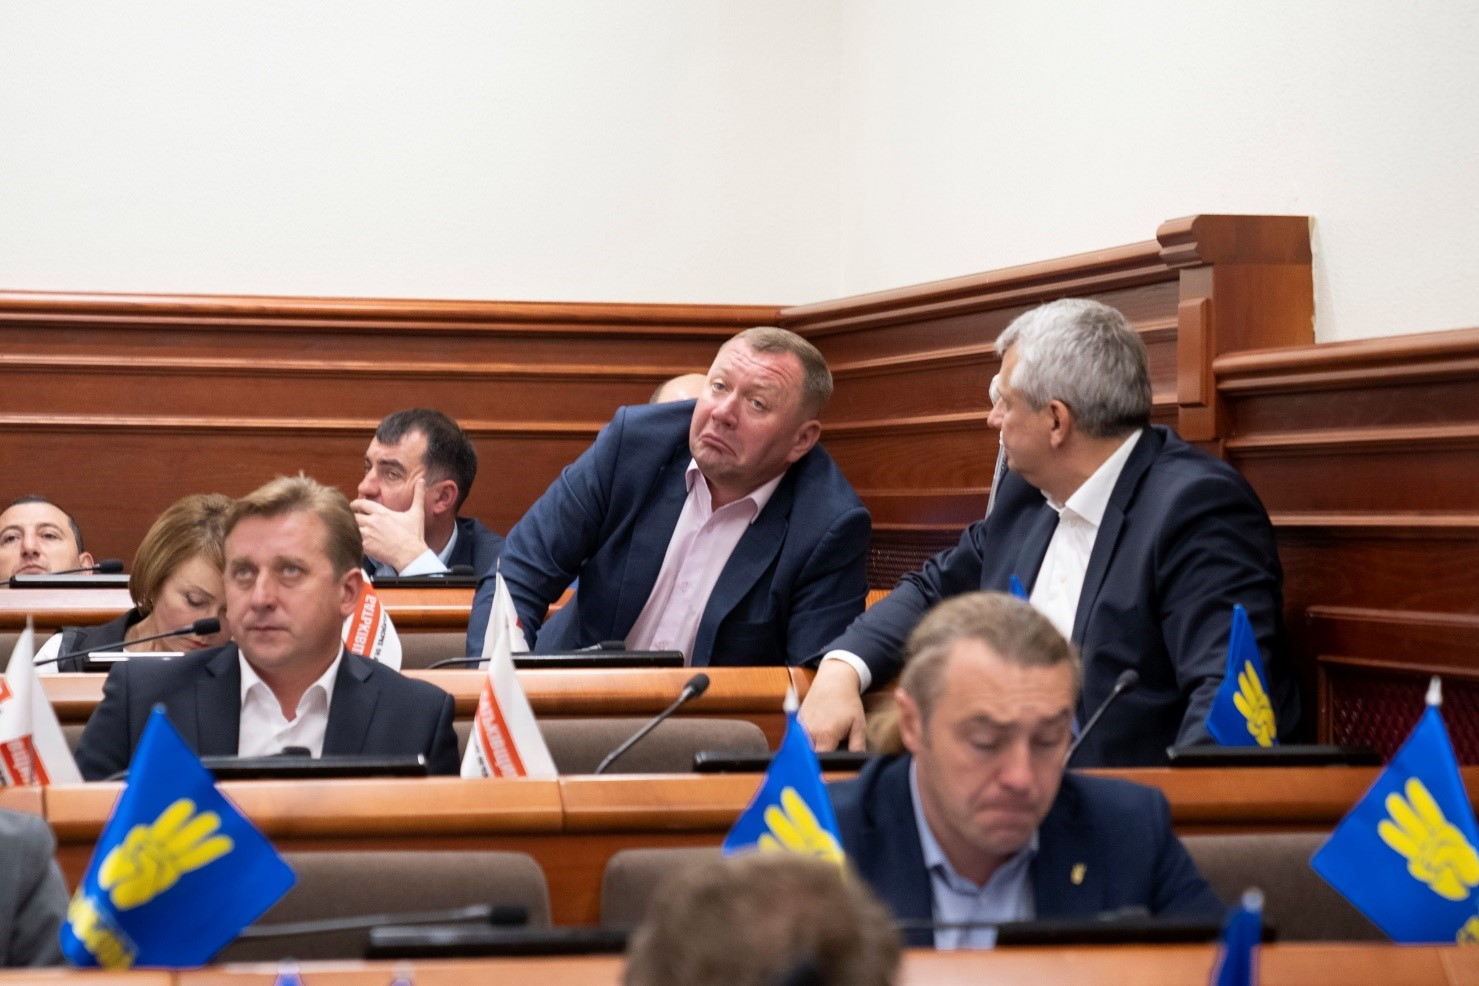 фракция свобода, Киеврада